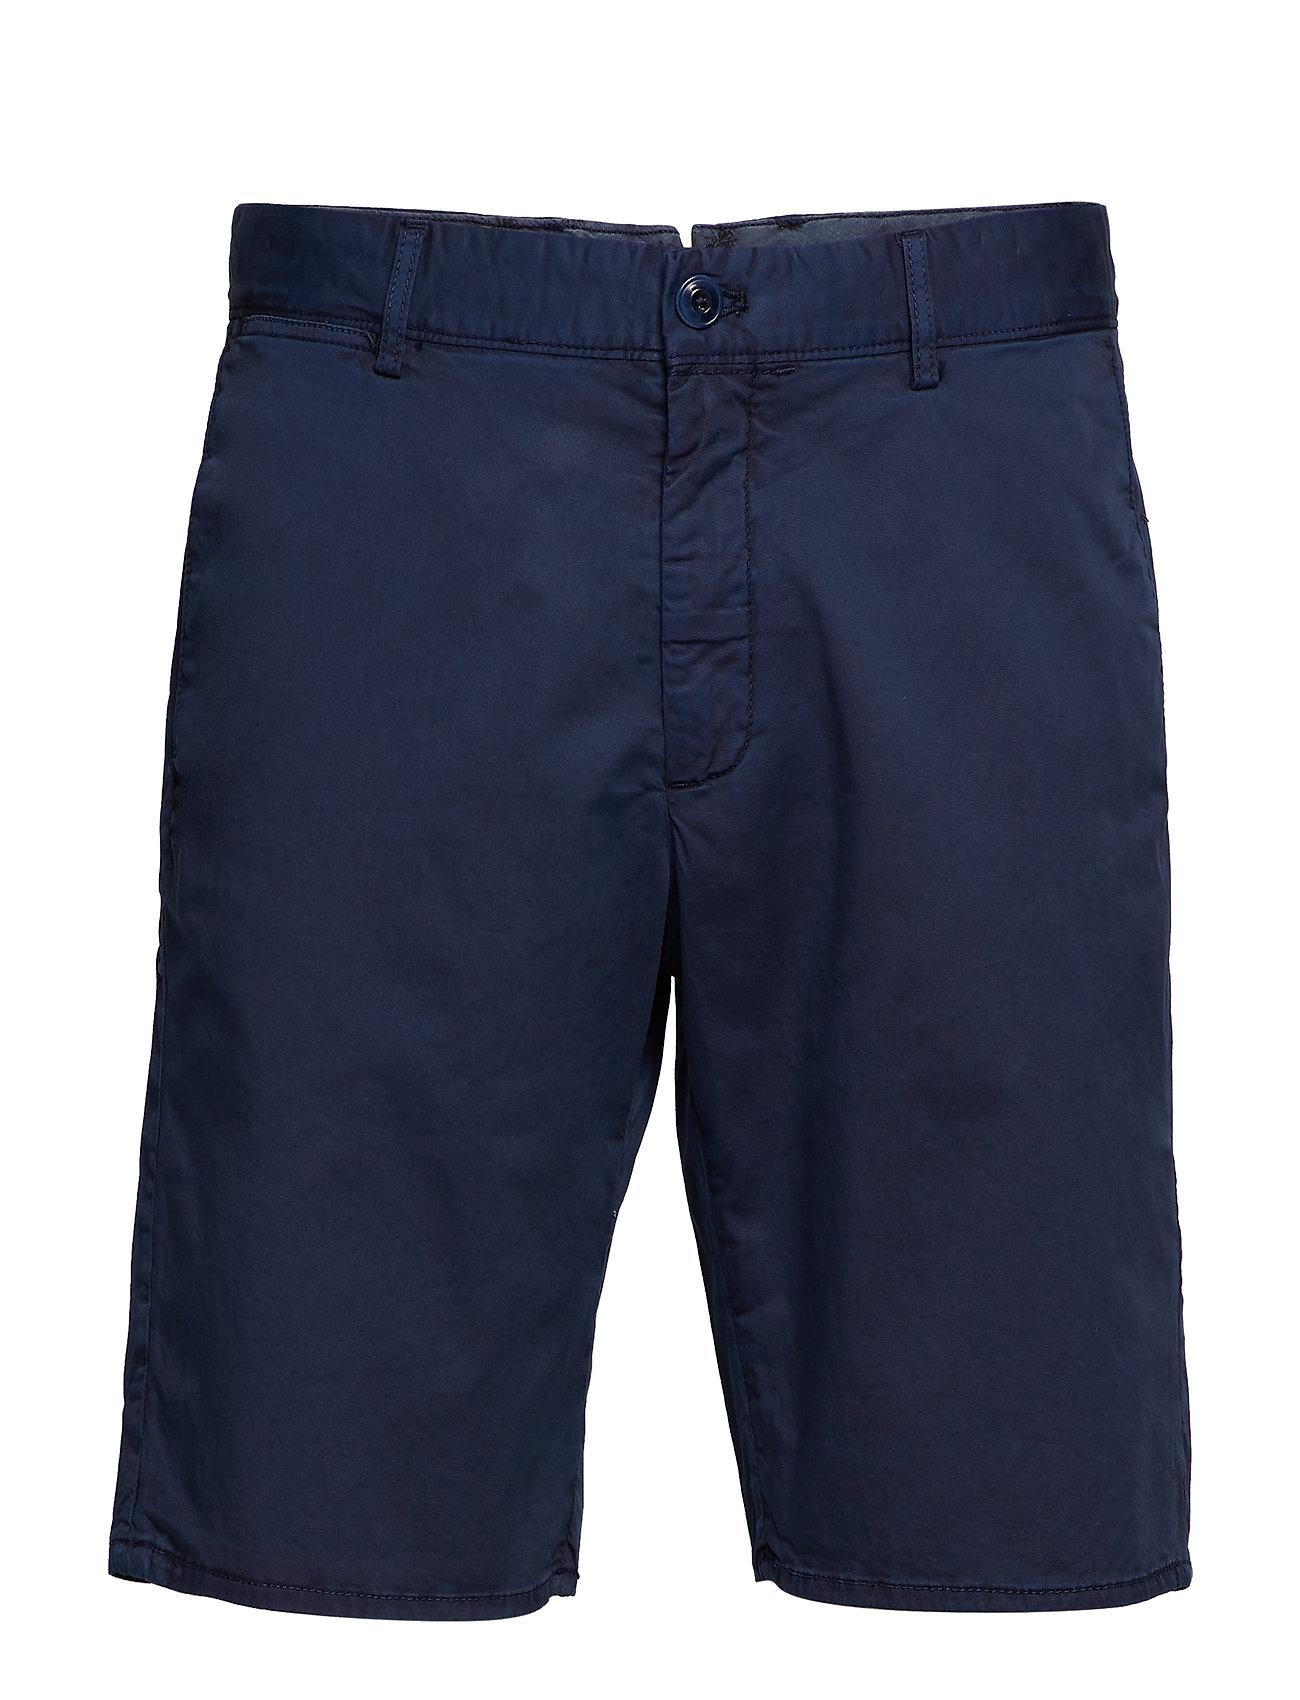 MANGO MAN Plain Cotton Chino Bermuda Shorts Shorts Chinos Shorts Blå MANGO MAN